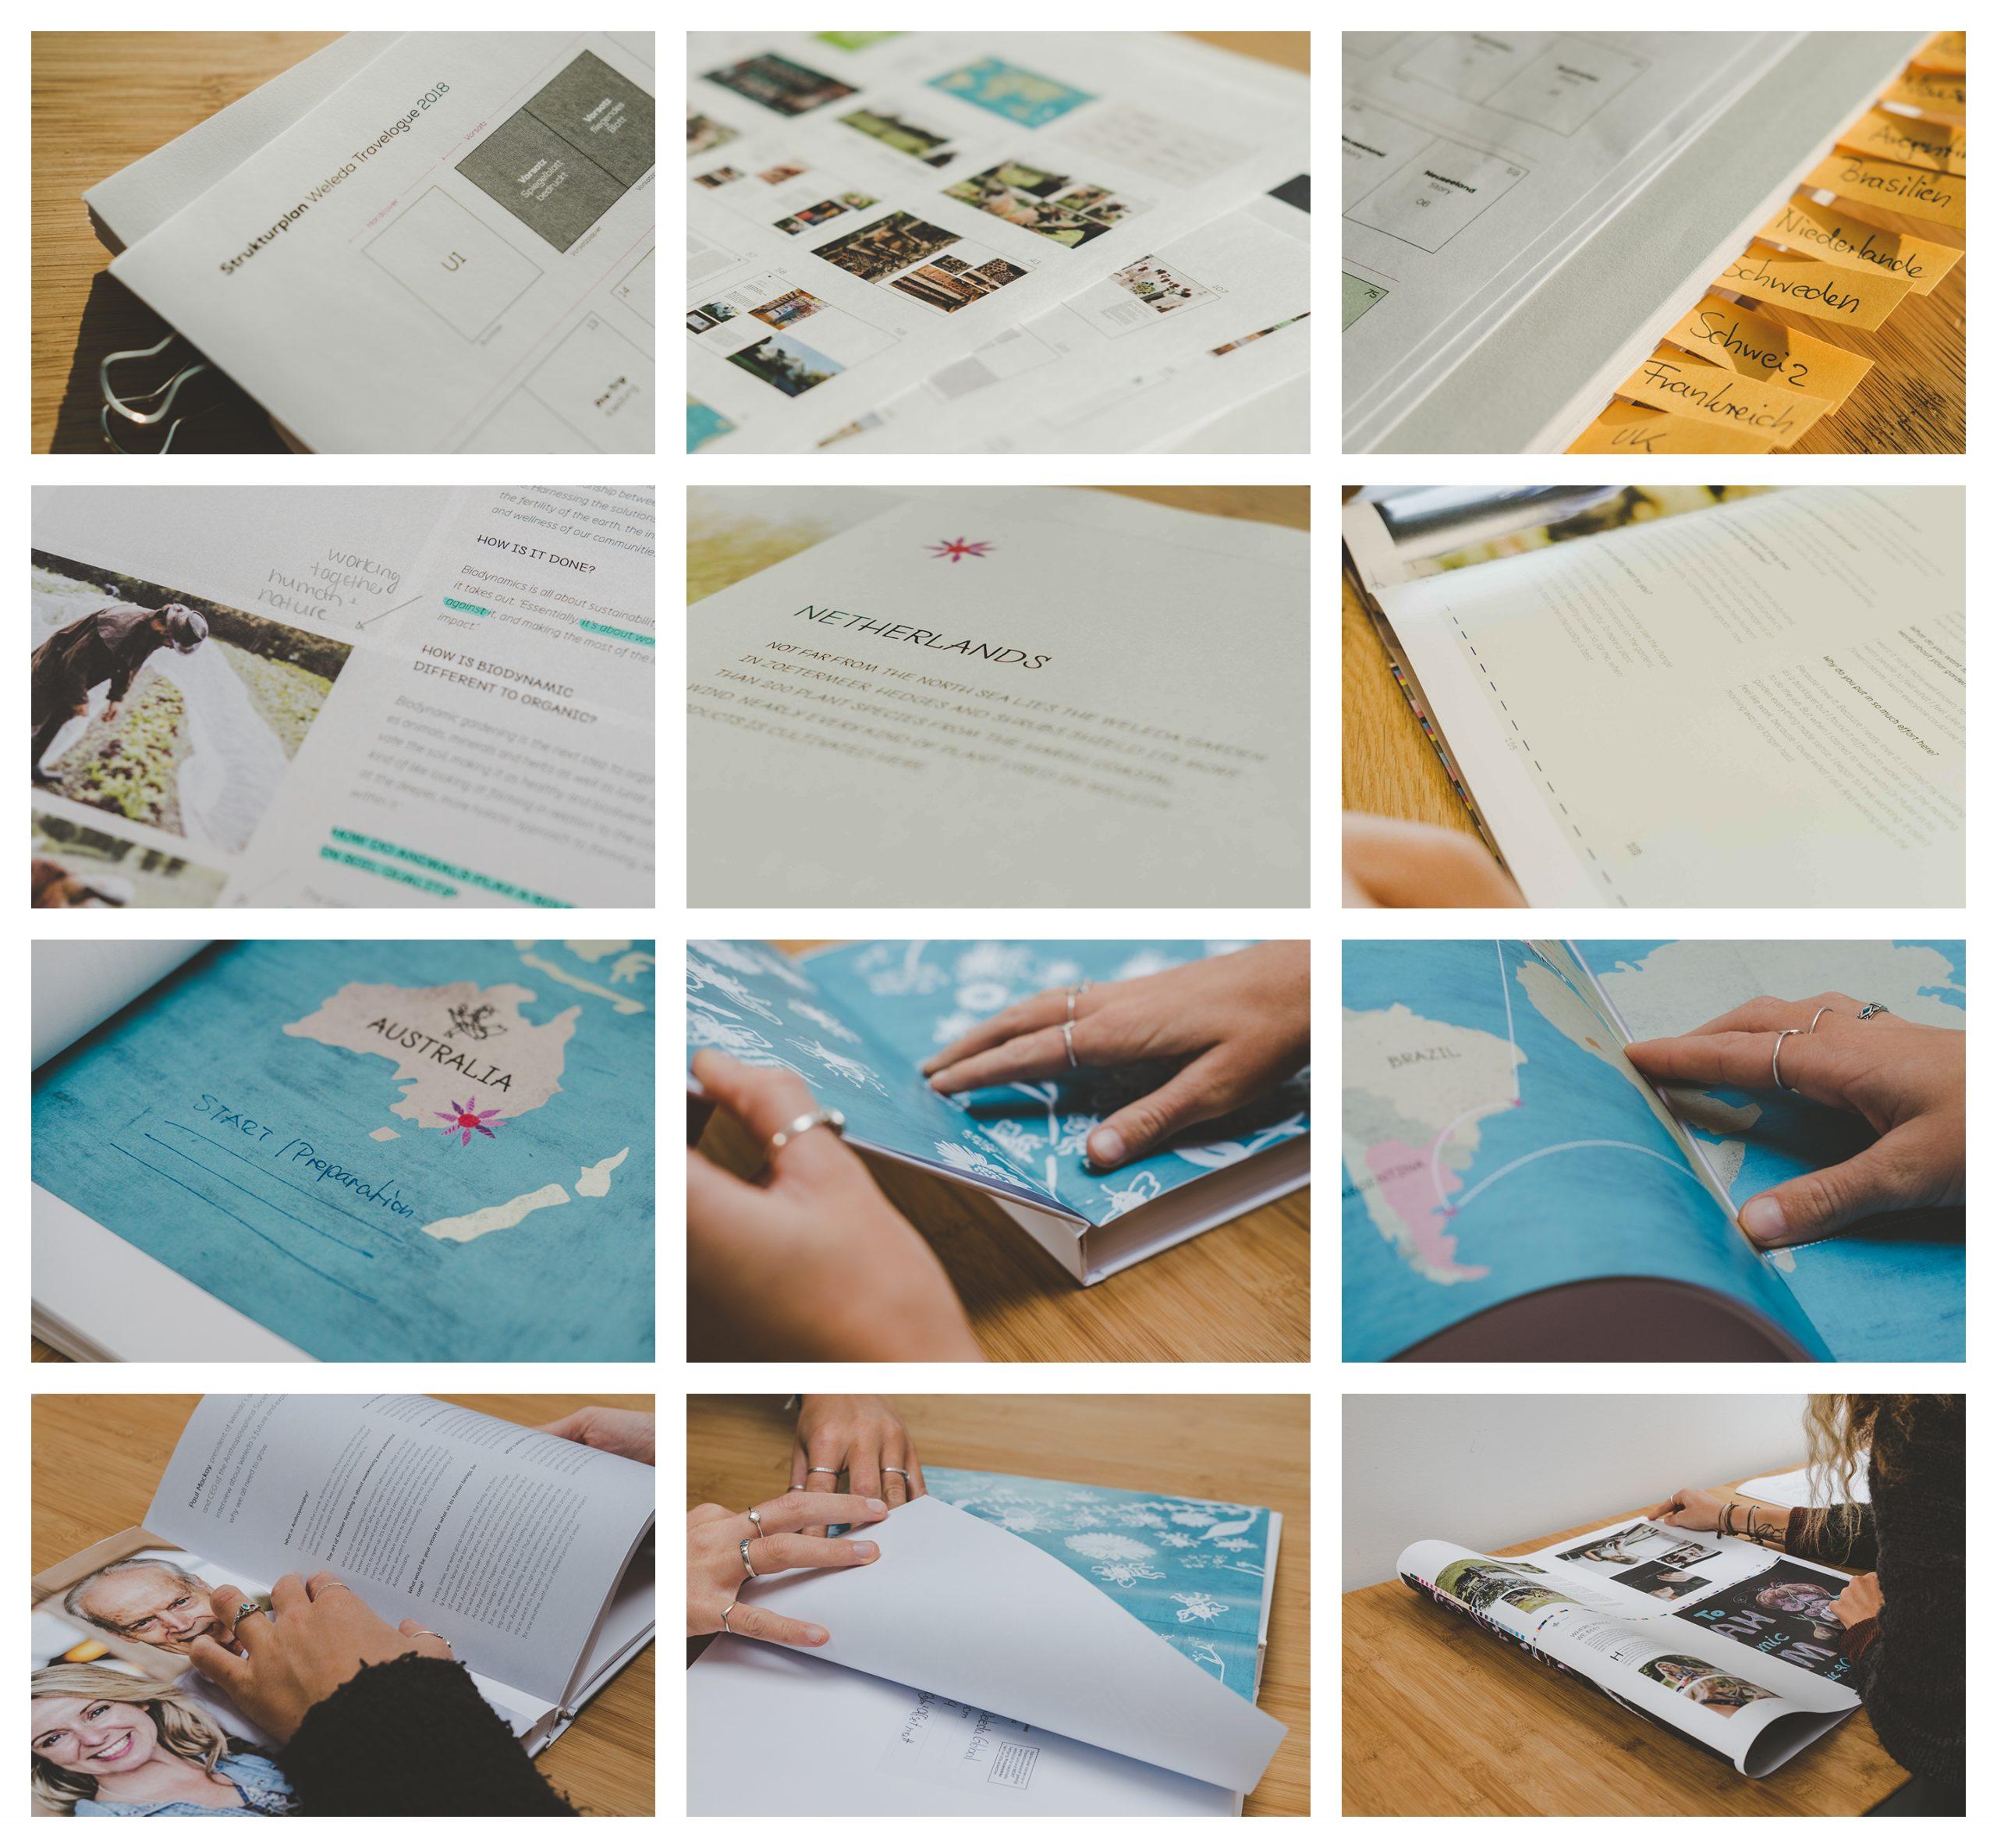 pascher-heinz-weleda-global-garden-book-print-approval